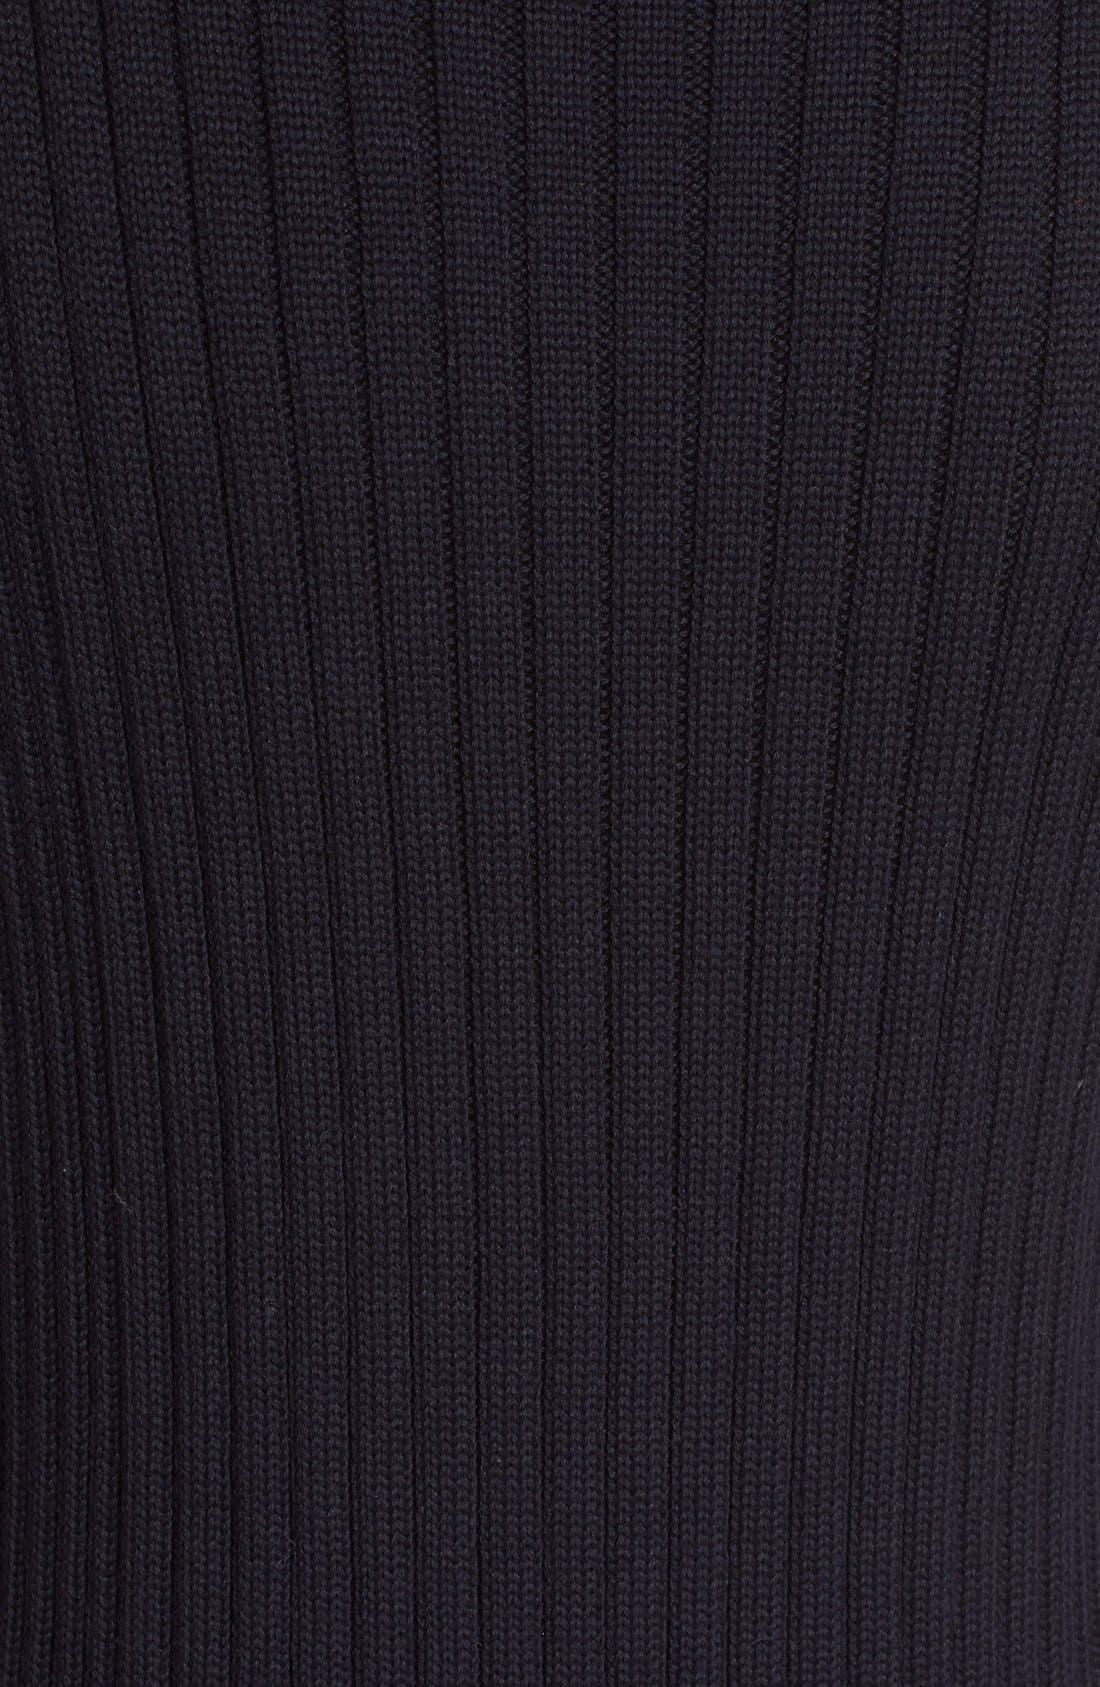 Alternate Image 3  - ACNE Studios 'Benita Clean' Zip Front Sweater Dress